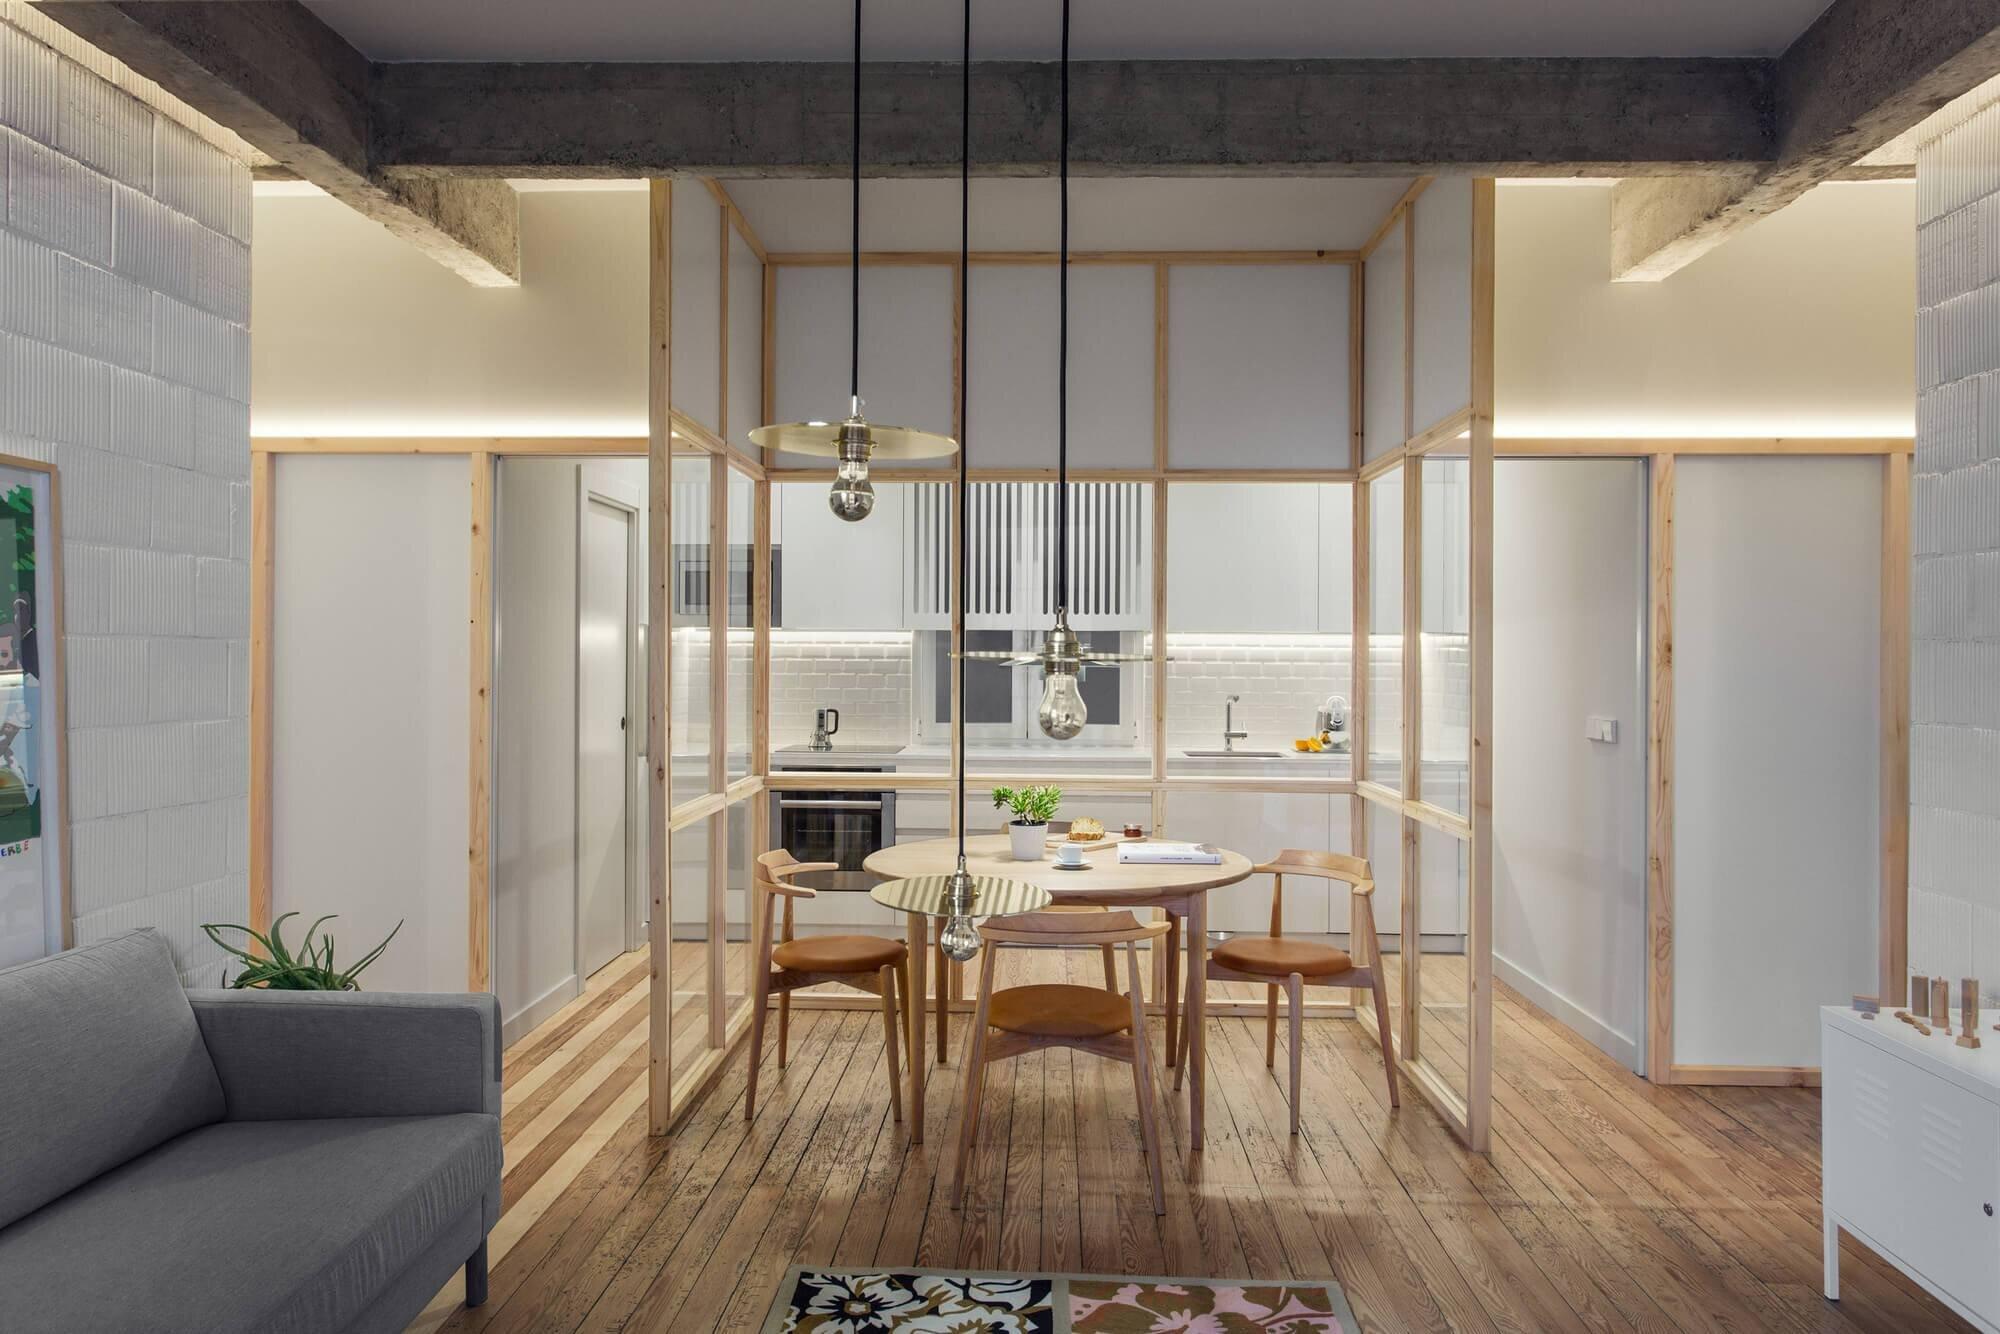 Pauzarq architects transform a floor in an old house into - Arquitectos en bilbao ...